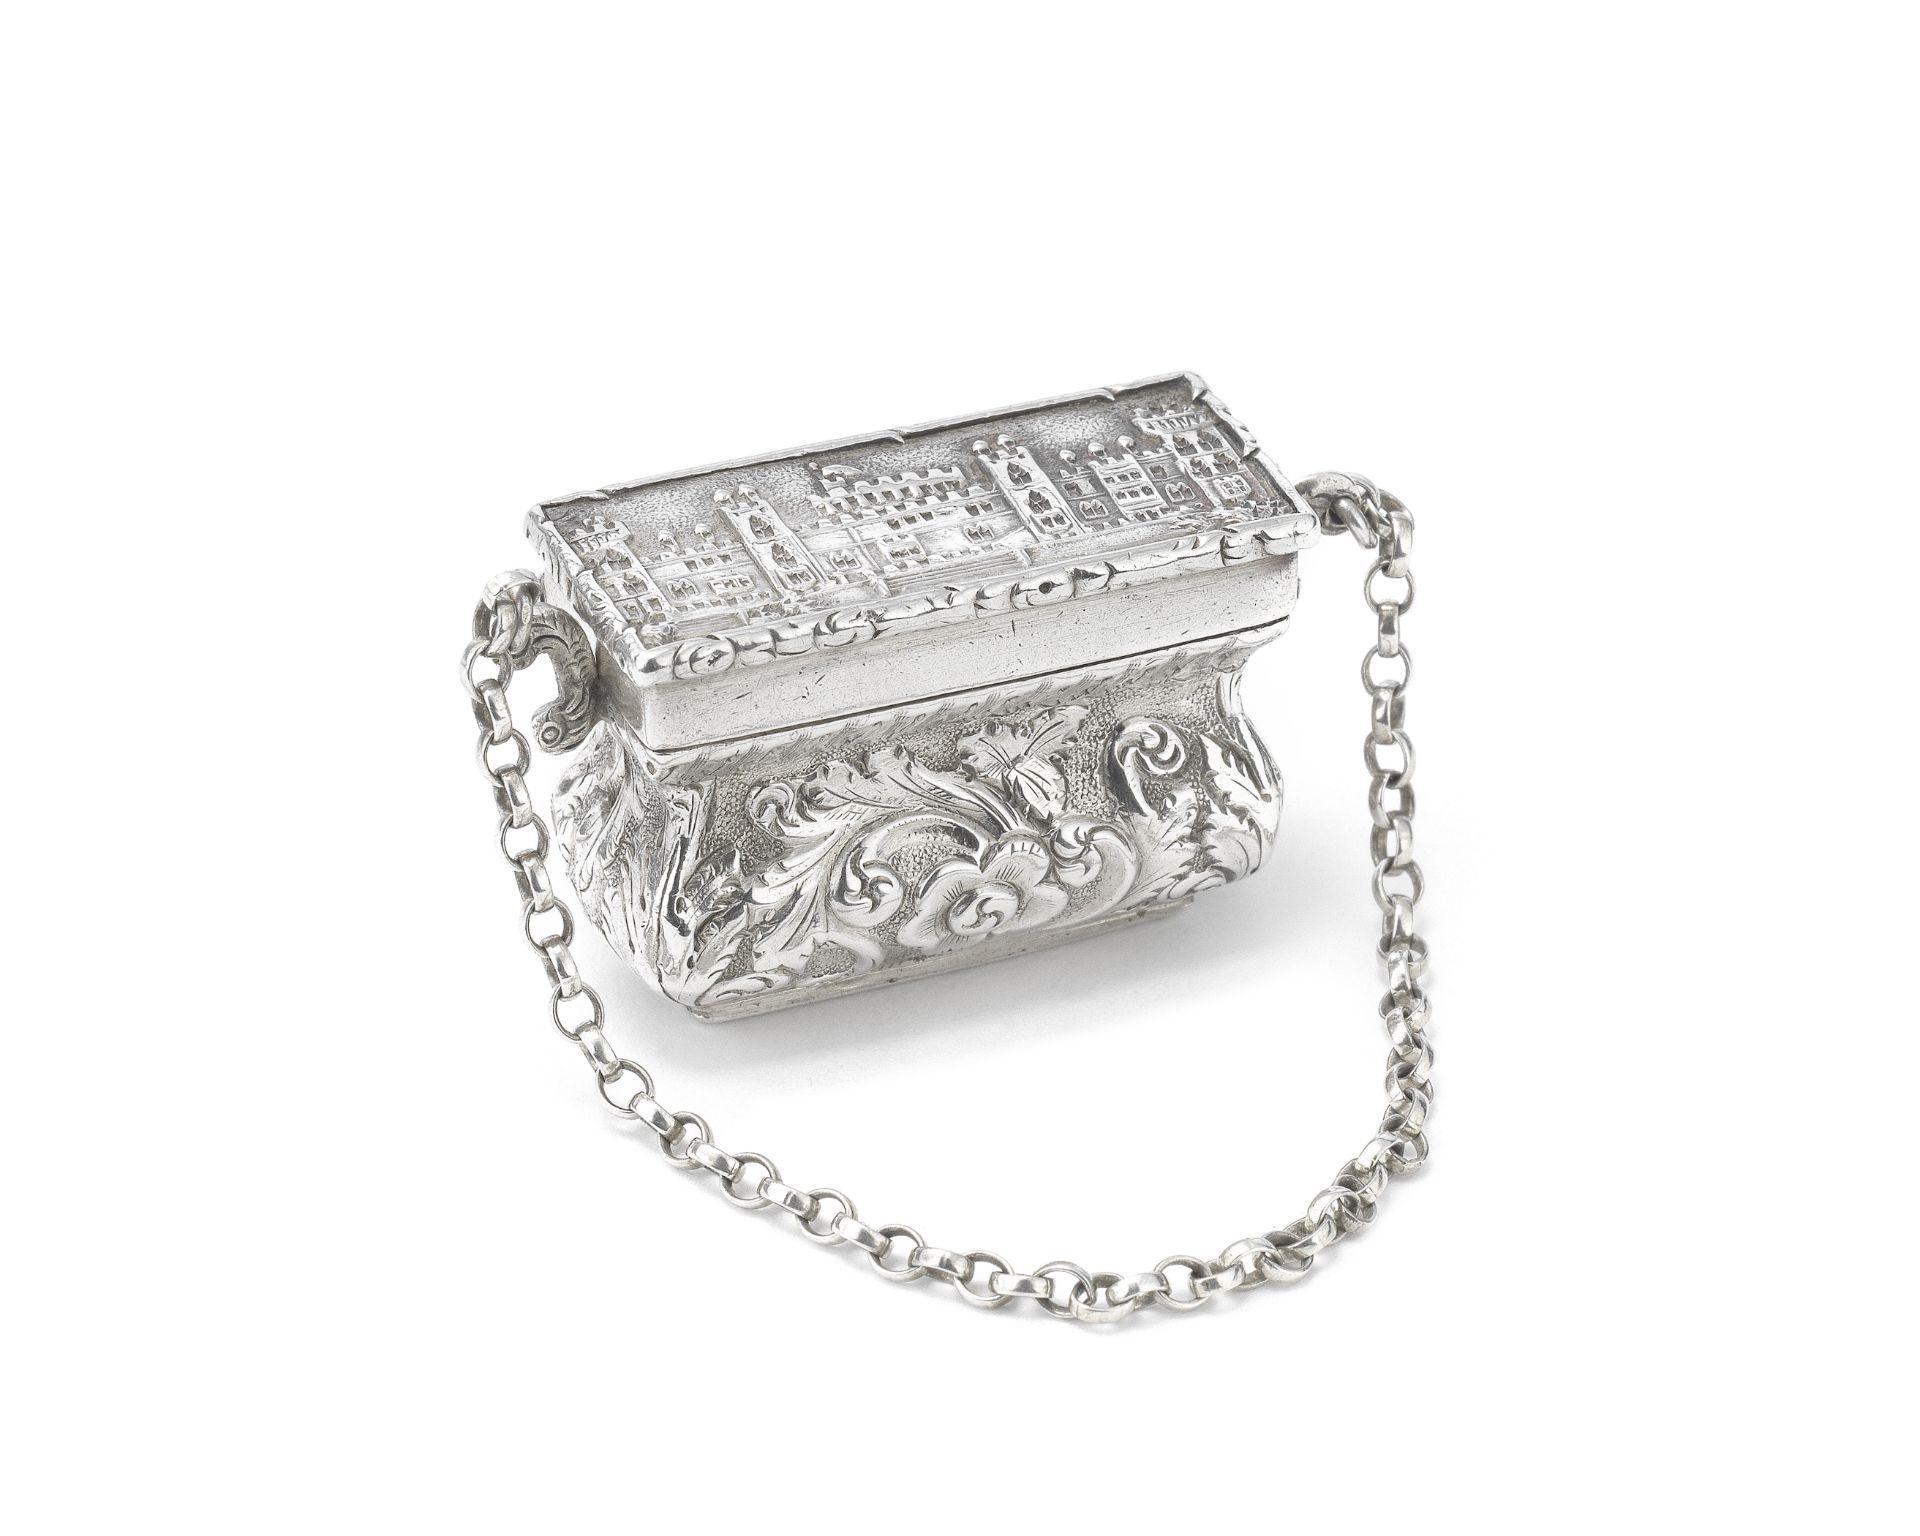 A Victorian 'castle-top' silver vinaigrette John Tongue, Birmingham 1845